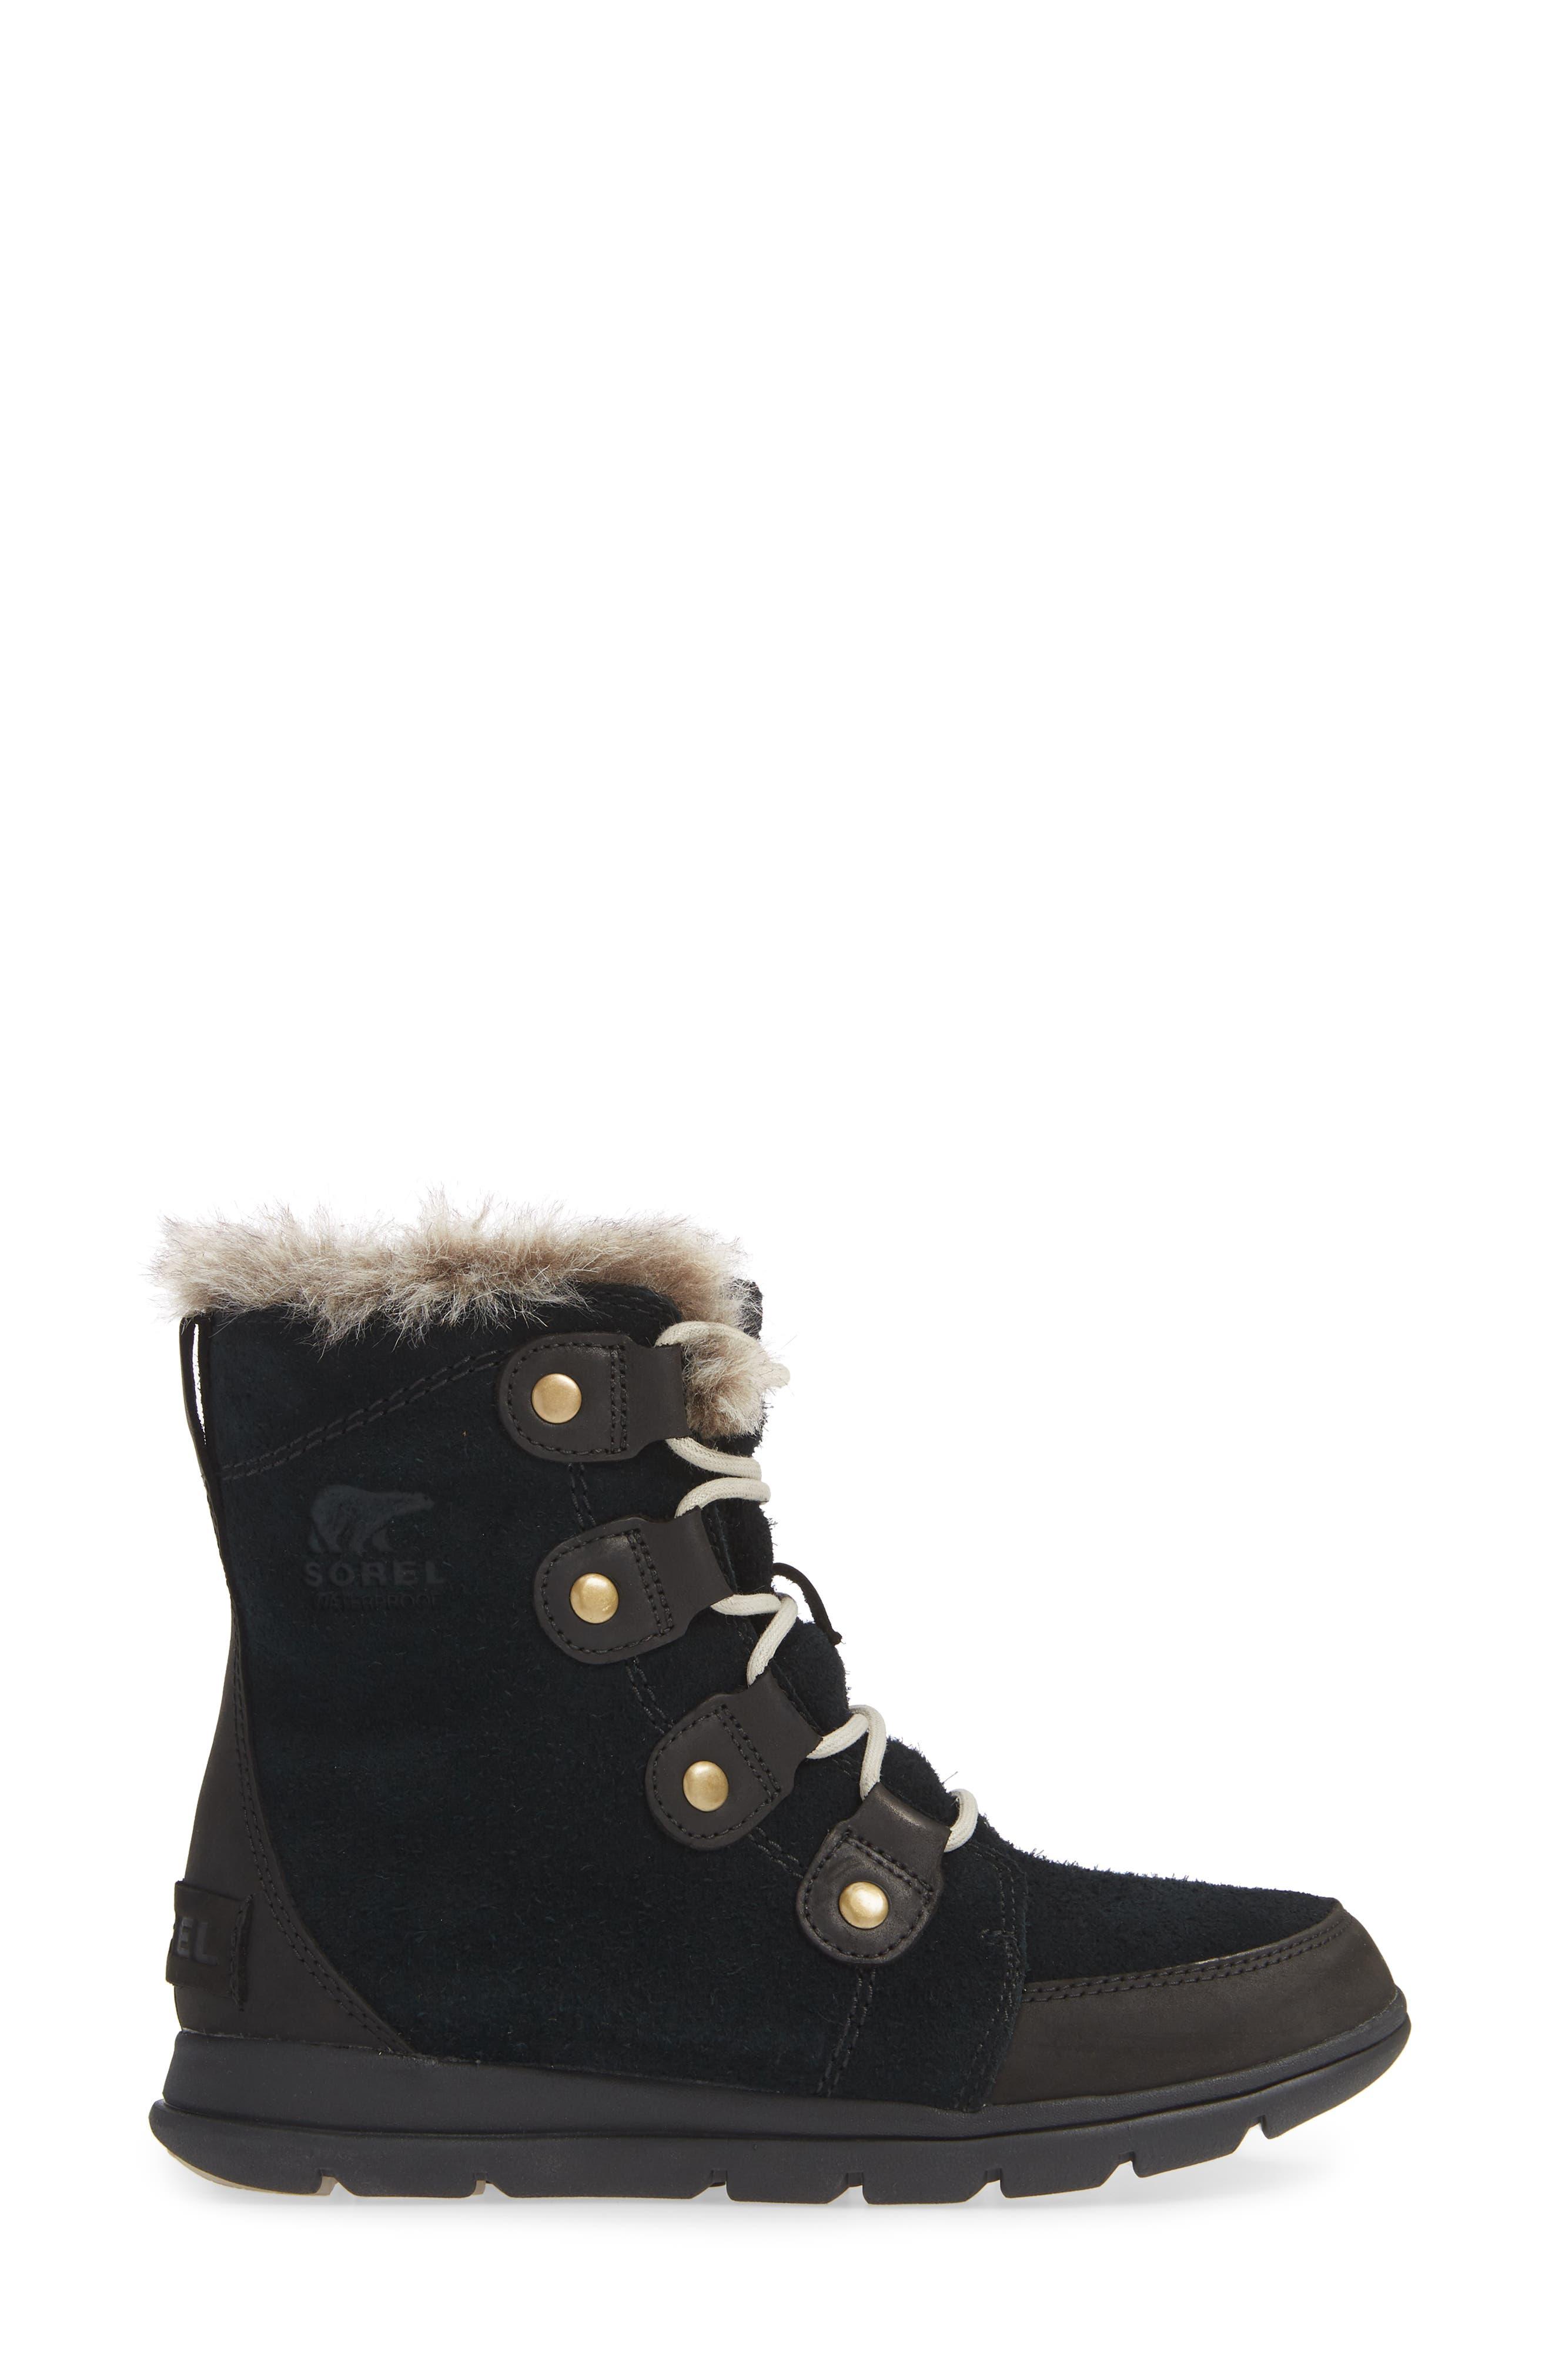 Explorer Joan Waterproof Boot with Faux Fur Collar,                             Alternate thumbnail 3, color,                             BLACK/ DARK STONE